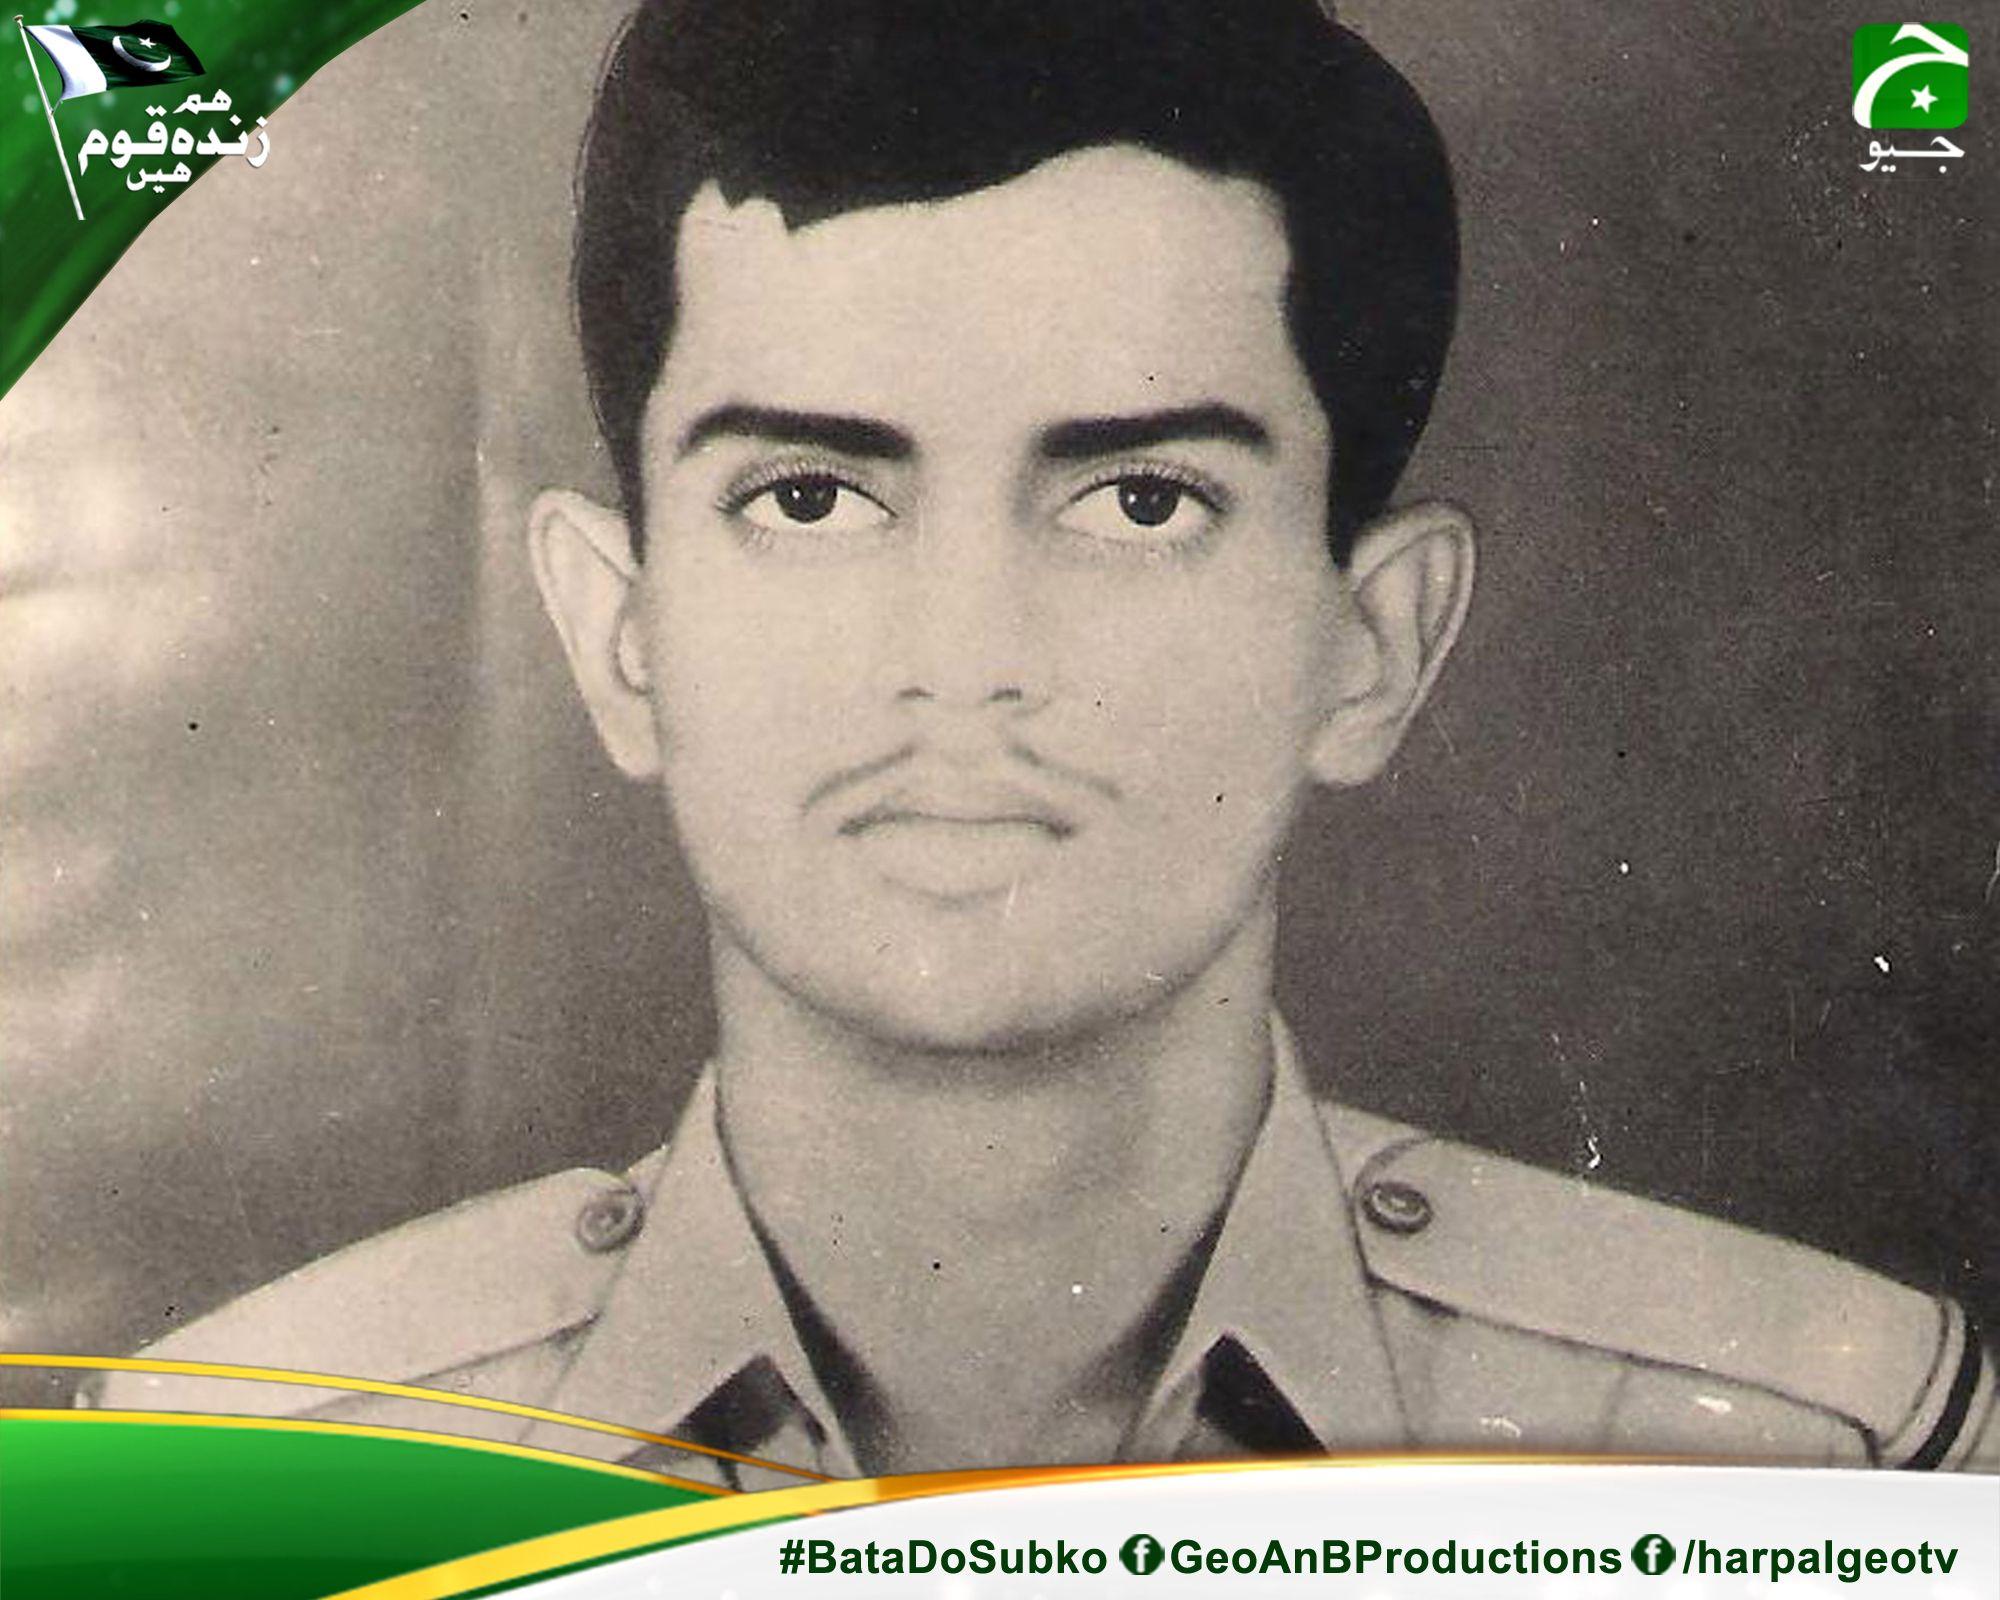 essay on our national hero rashid minhas